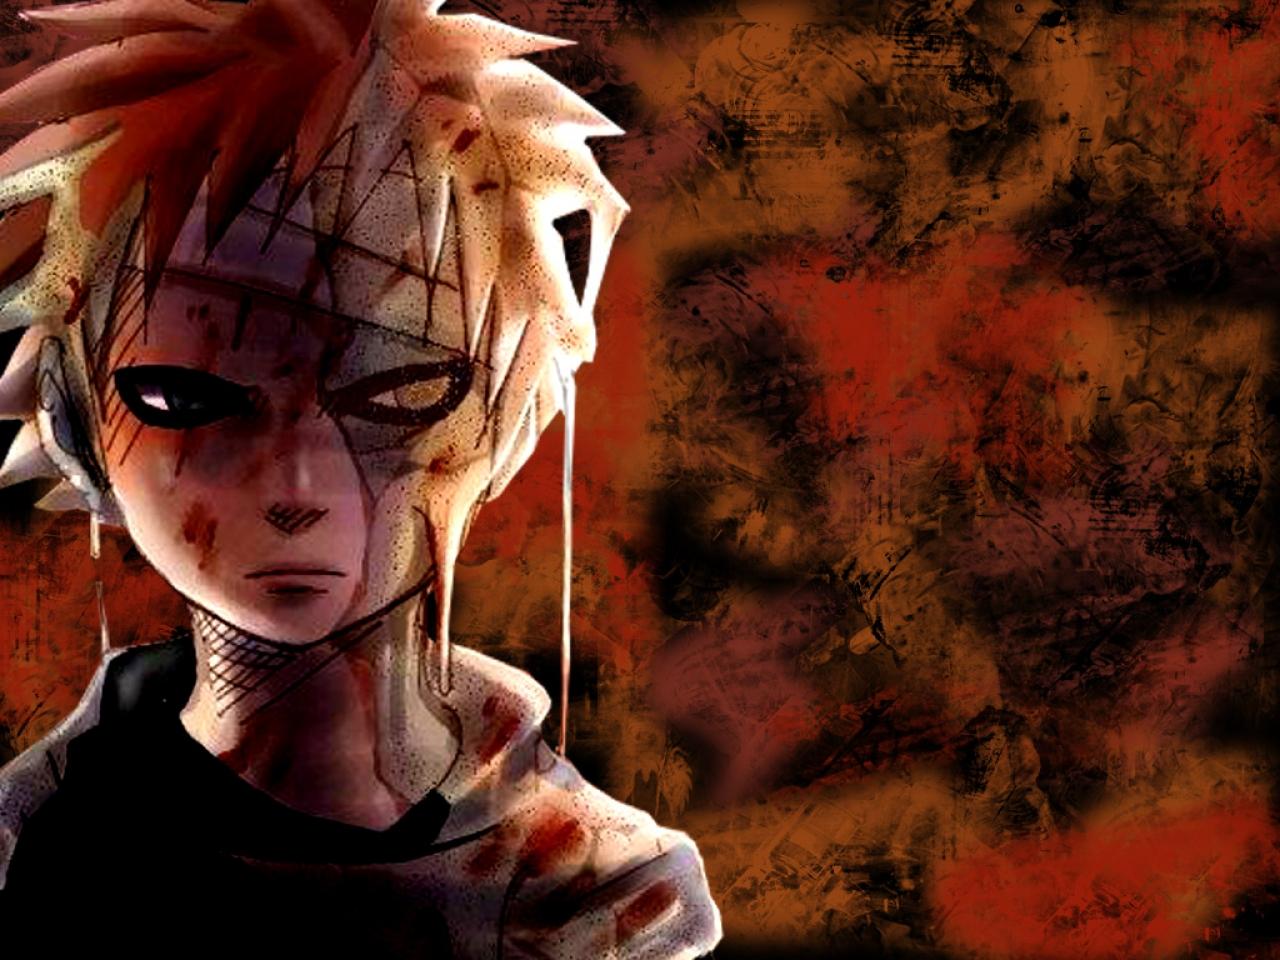 Naruto And Bleach Anime Wallpapers Managa Style Gaara 1280x960